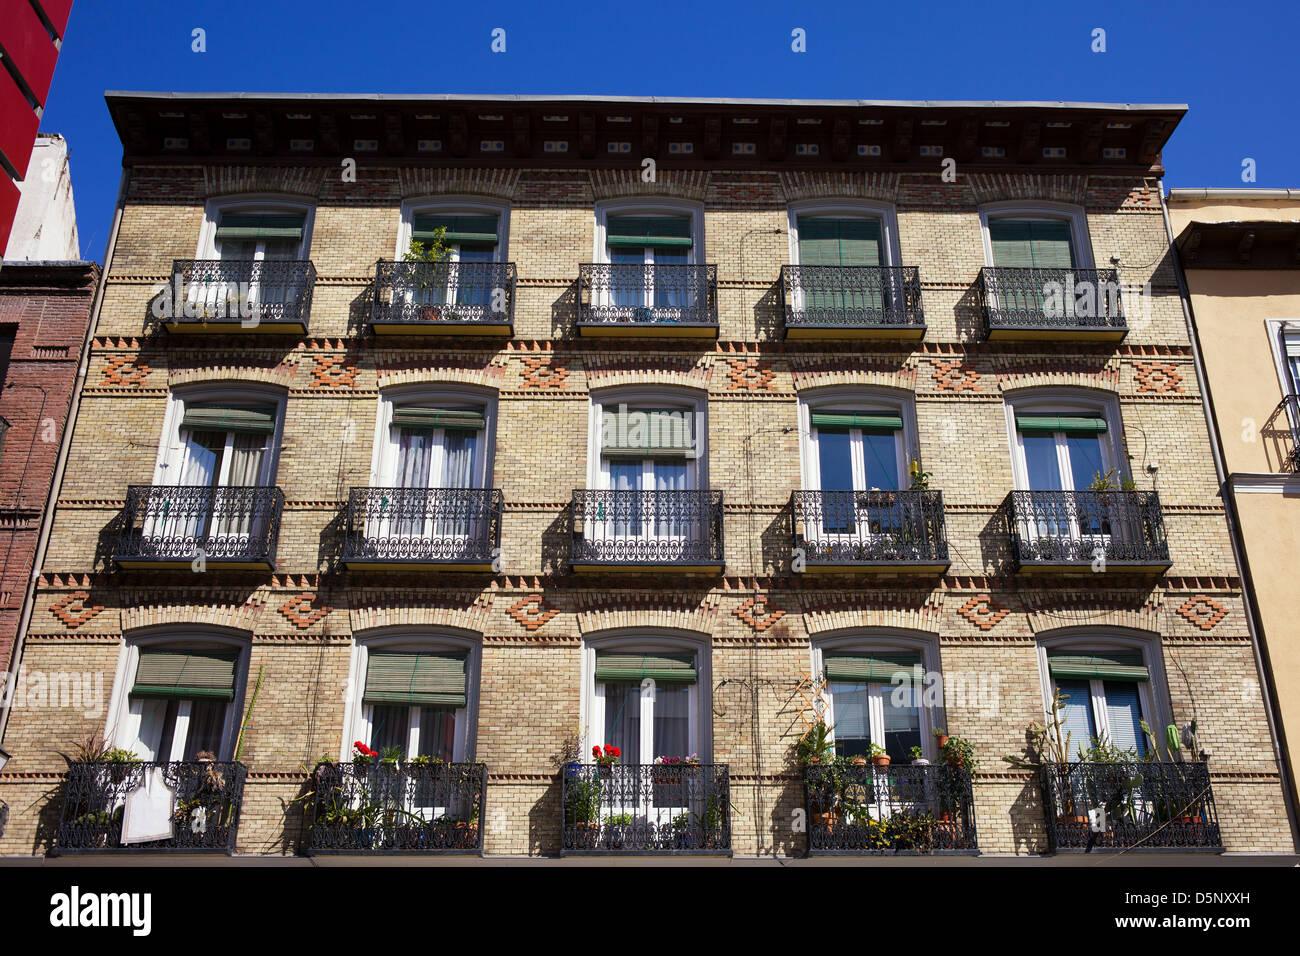 Old Apartment Building With Balconies Brick Facade In Madrid Old Apartment  Building With Balconies Brick Facade